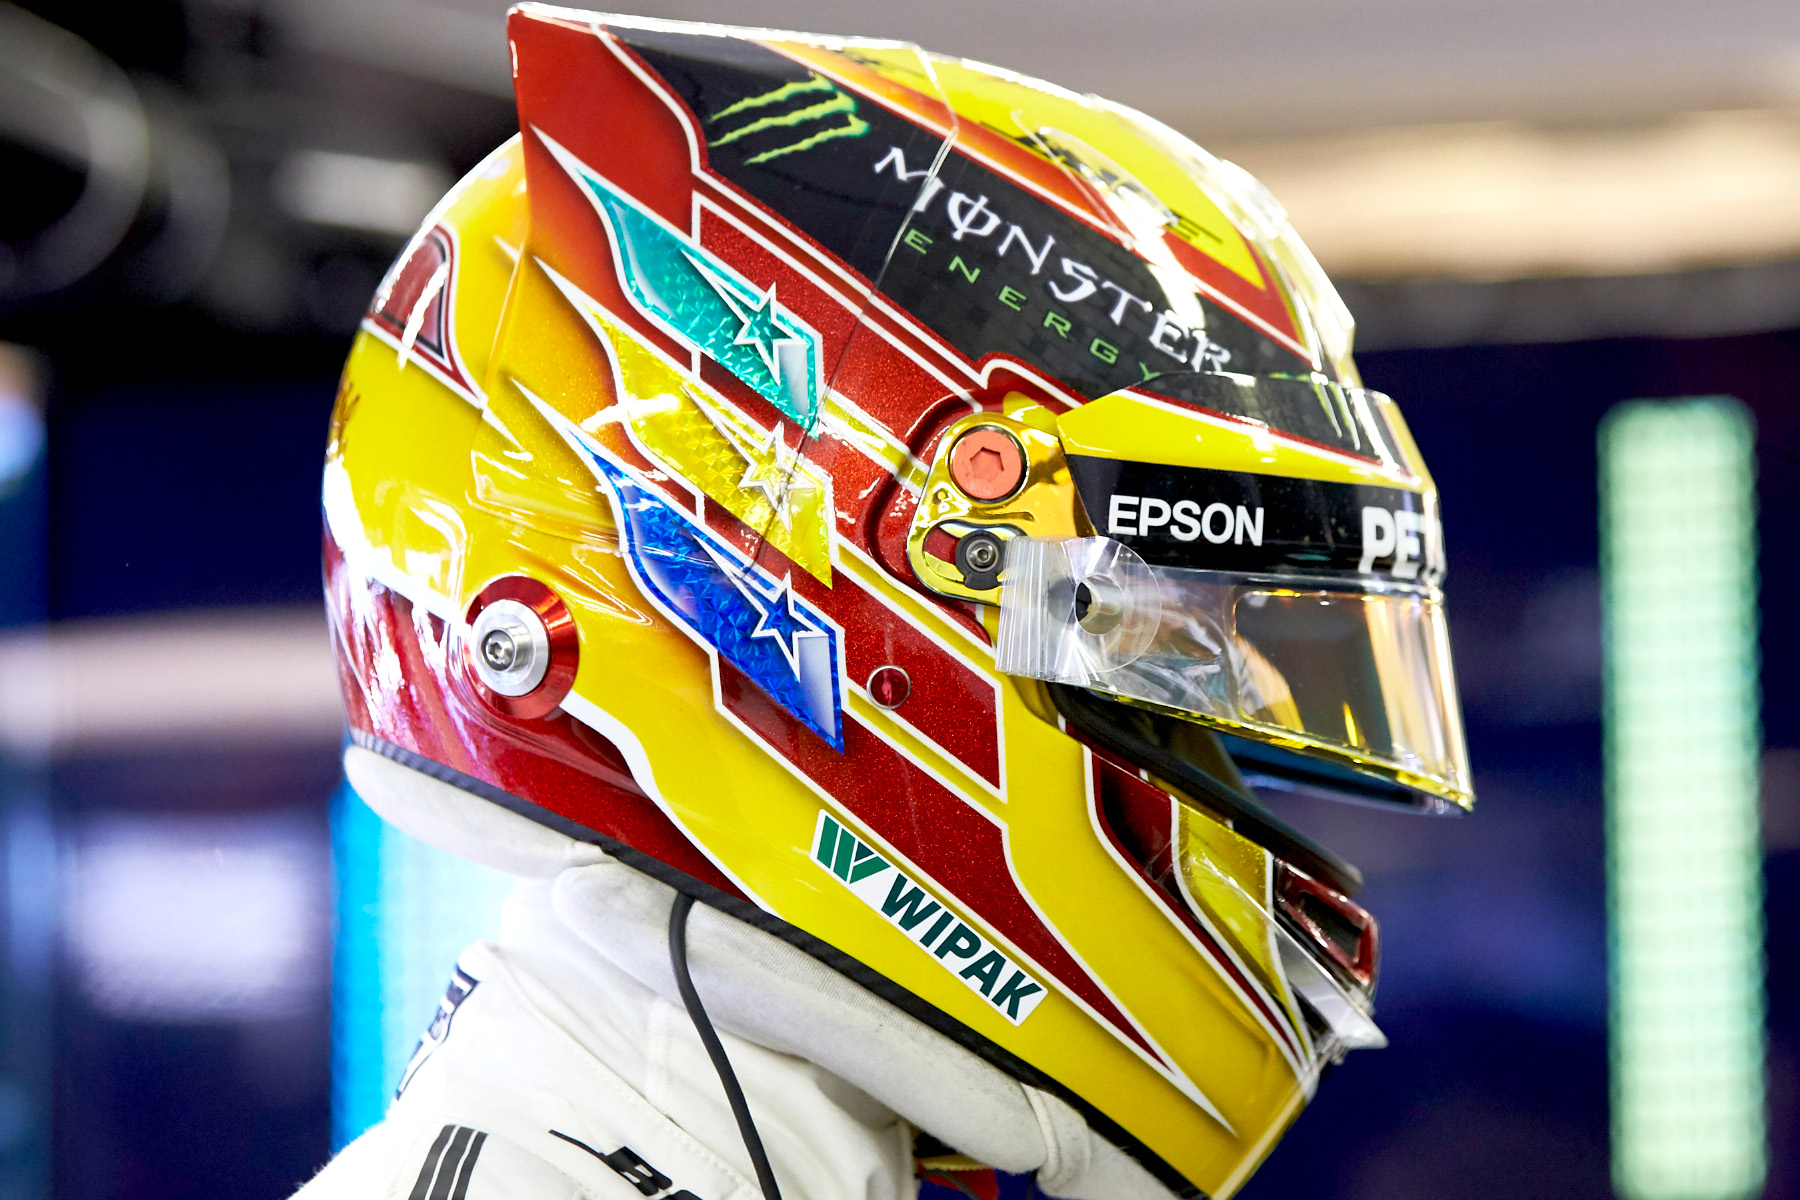 Lewis Hamilton at the 2017 Hungarian Grand Prix.